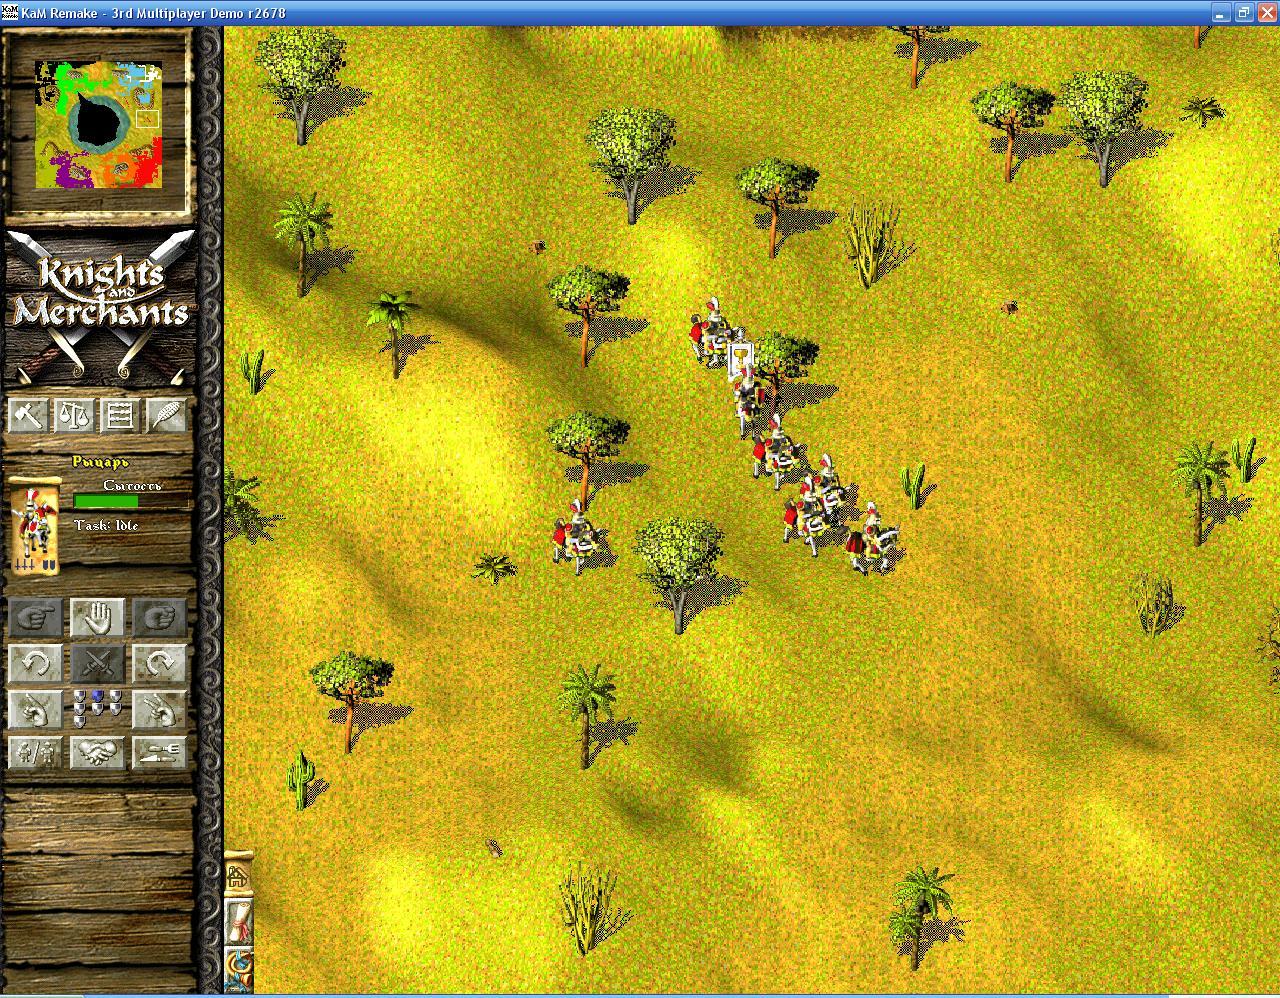 knights oasis.JPG - Knights & Merchants: The Peasants Rebellion